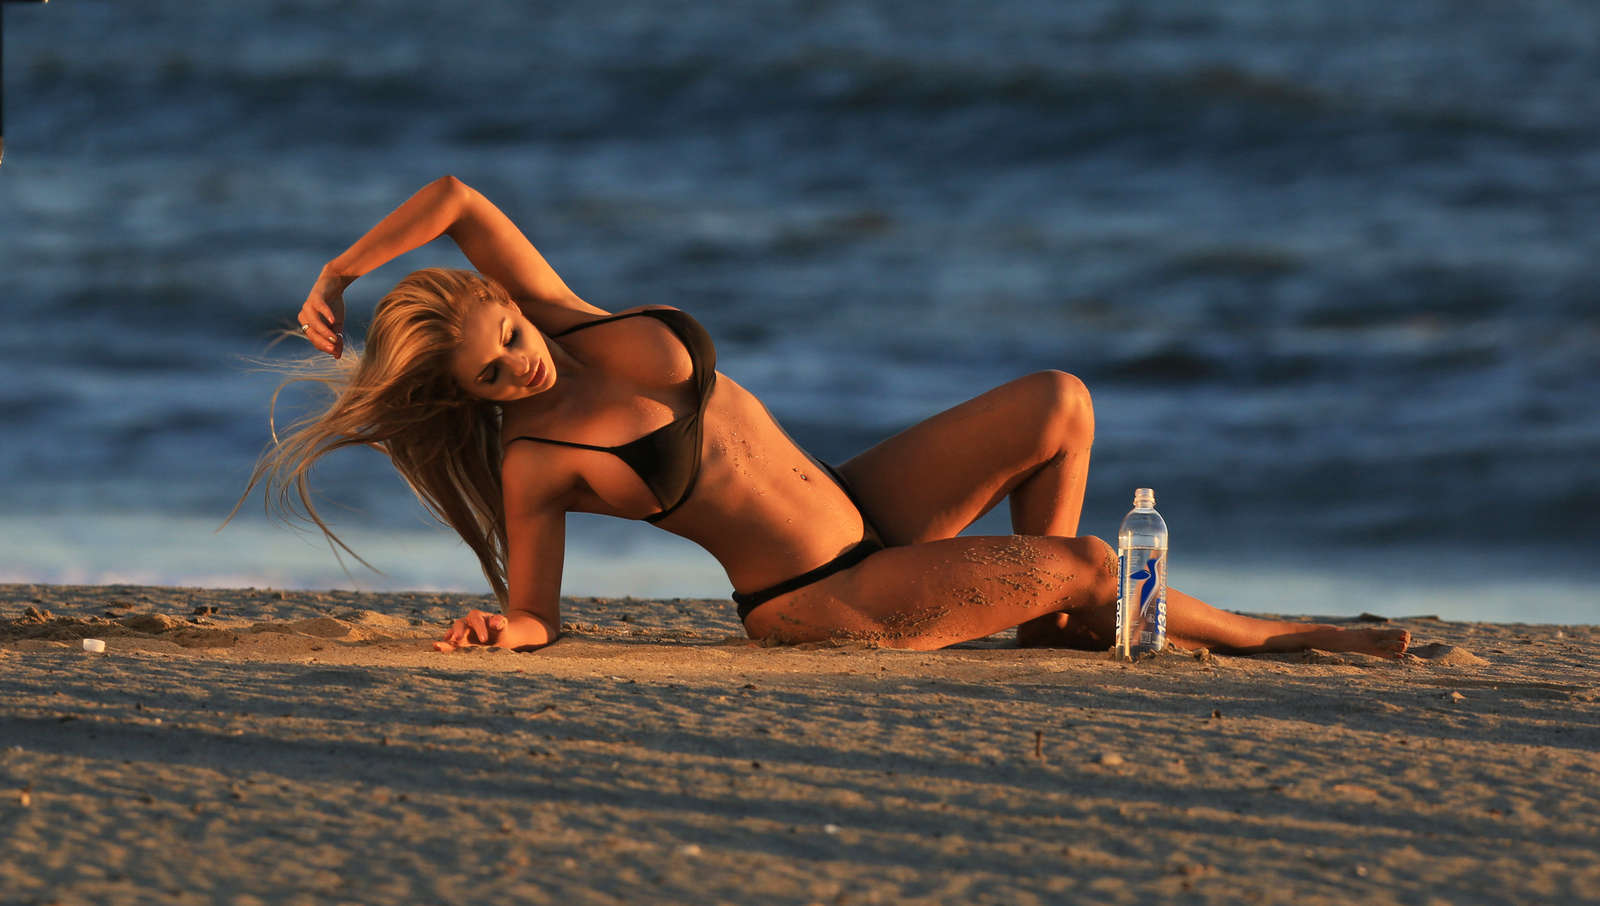 Amy-Lee-Summers--138-Water-Bikini--07